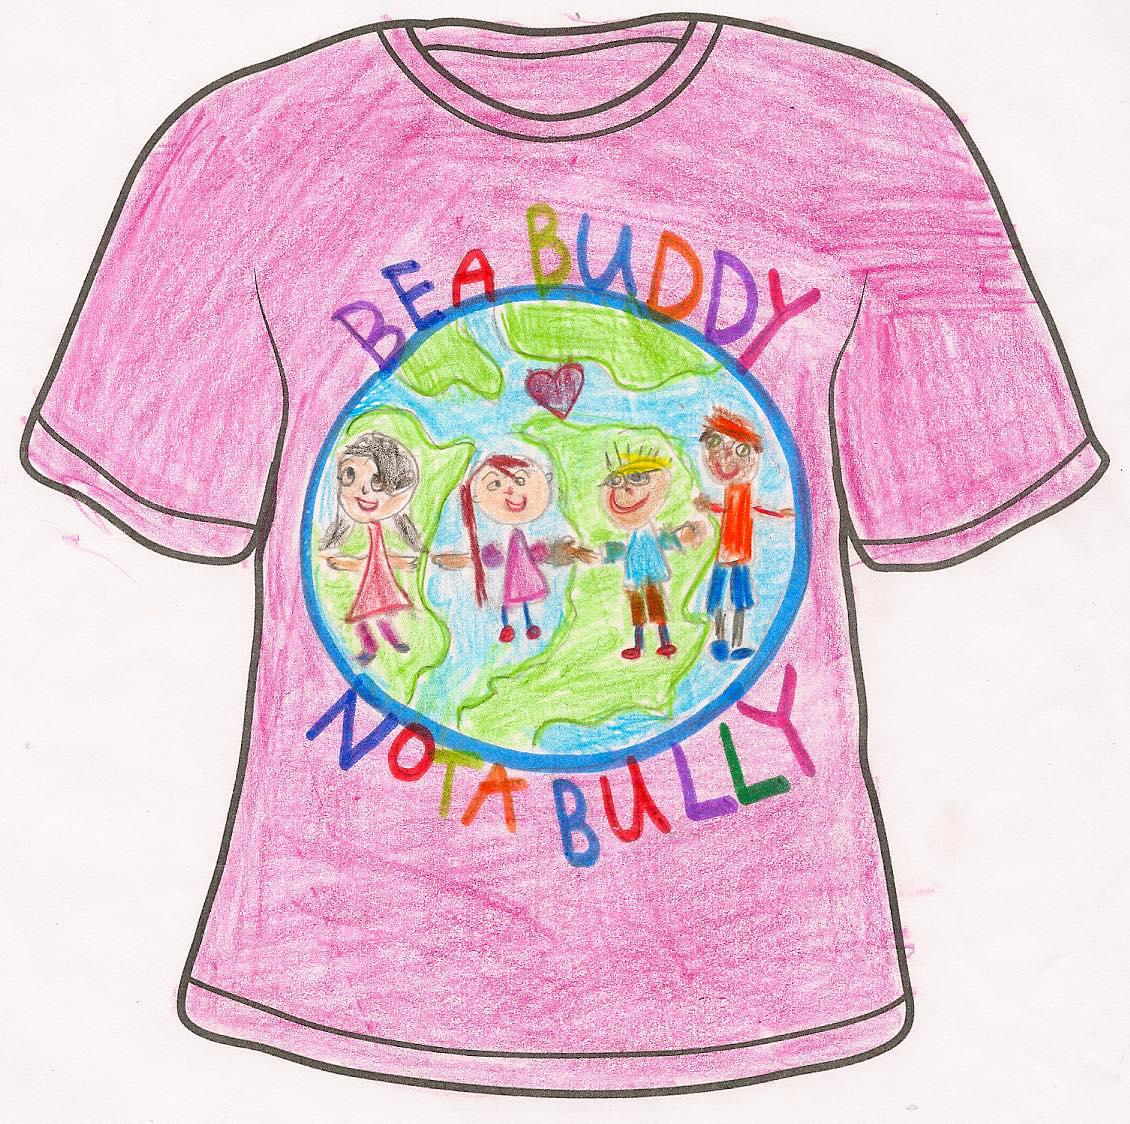 Pink Shirt Day T-Shirt Design Winners – St. Bonaventure's College